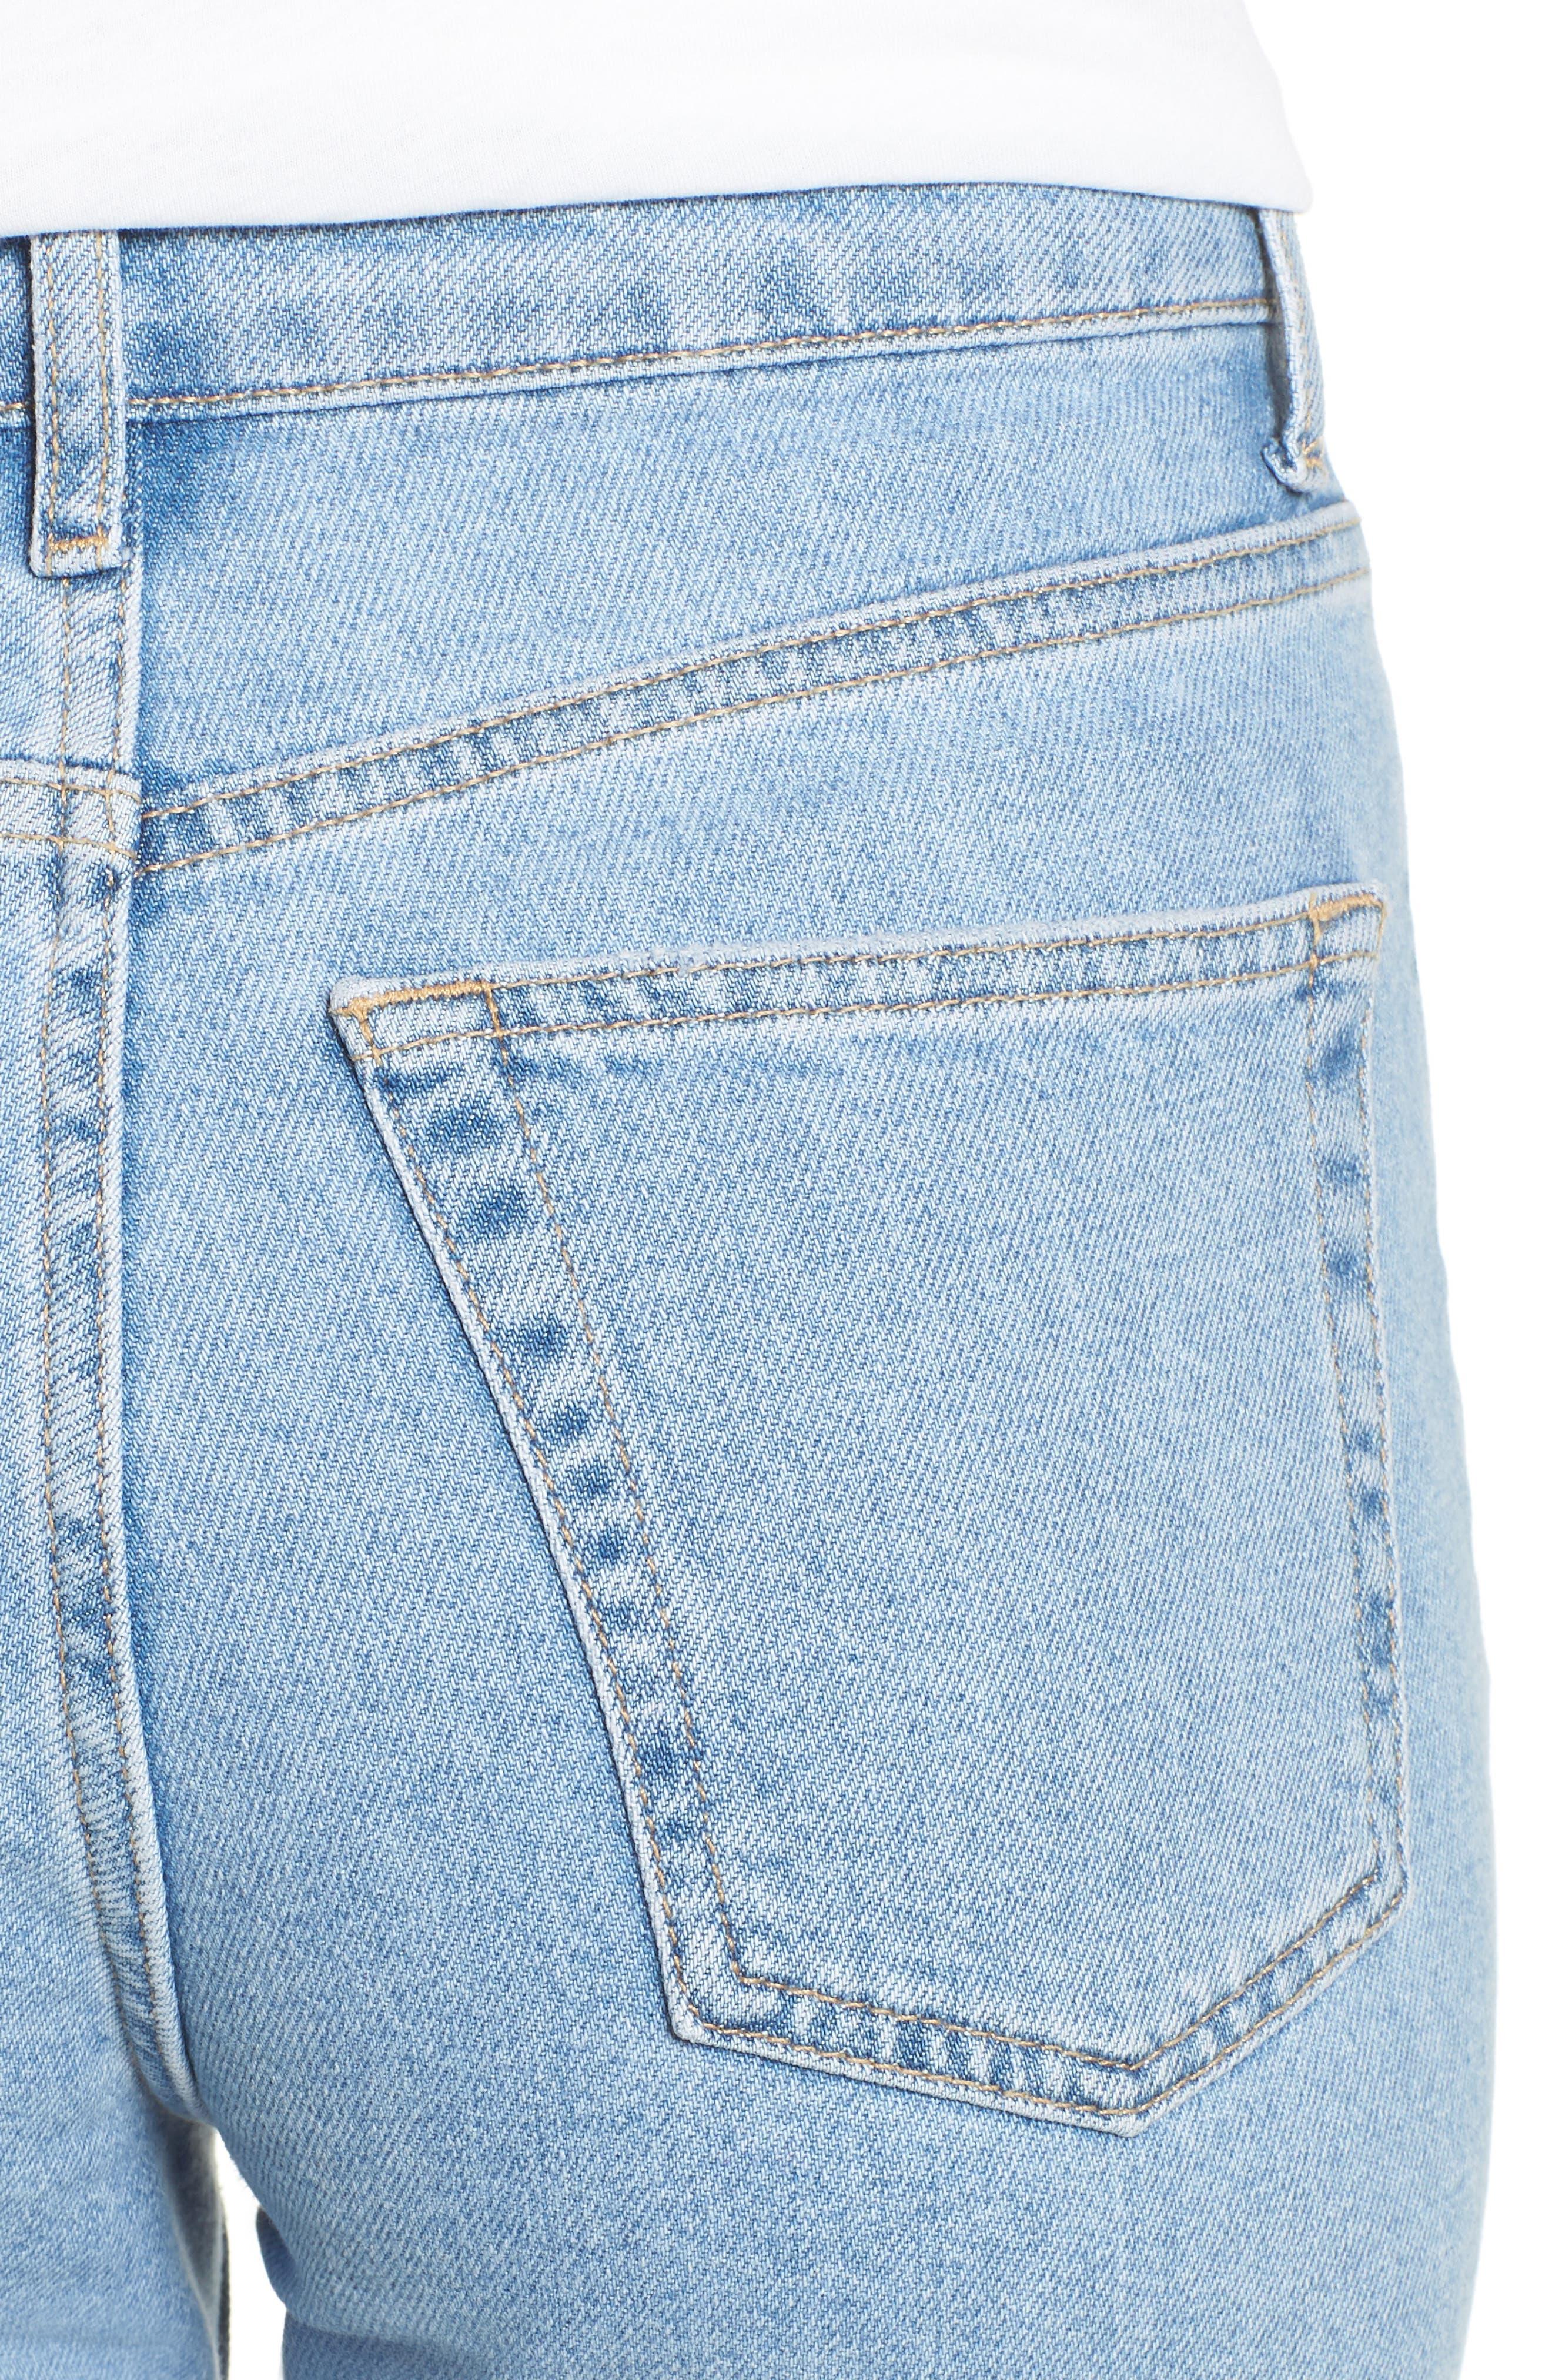 Raw Hem Straight Leg Jeans,                             Alternate thumbnail 4, color,                             BLEACH STONE DENIM